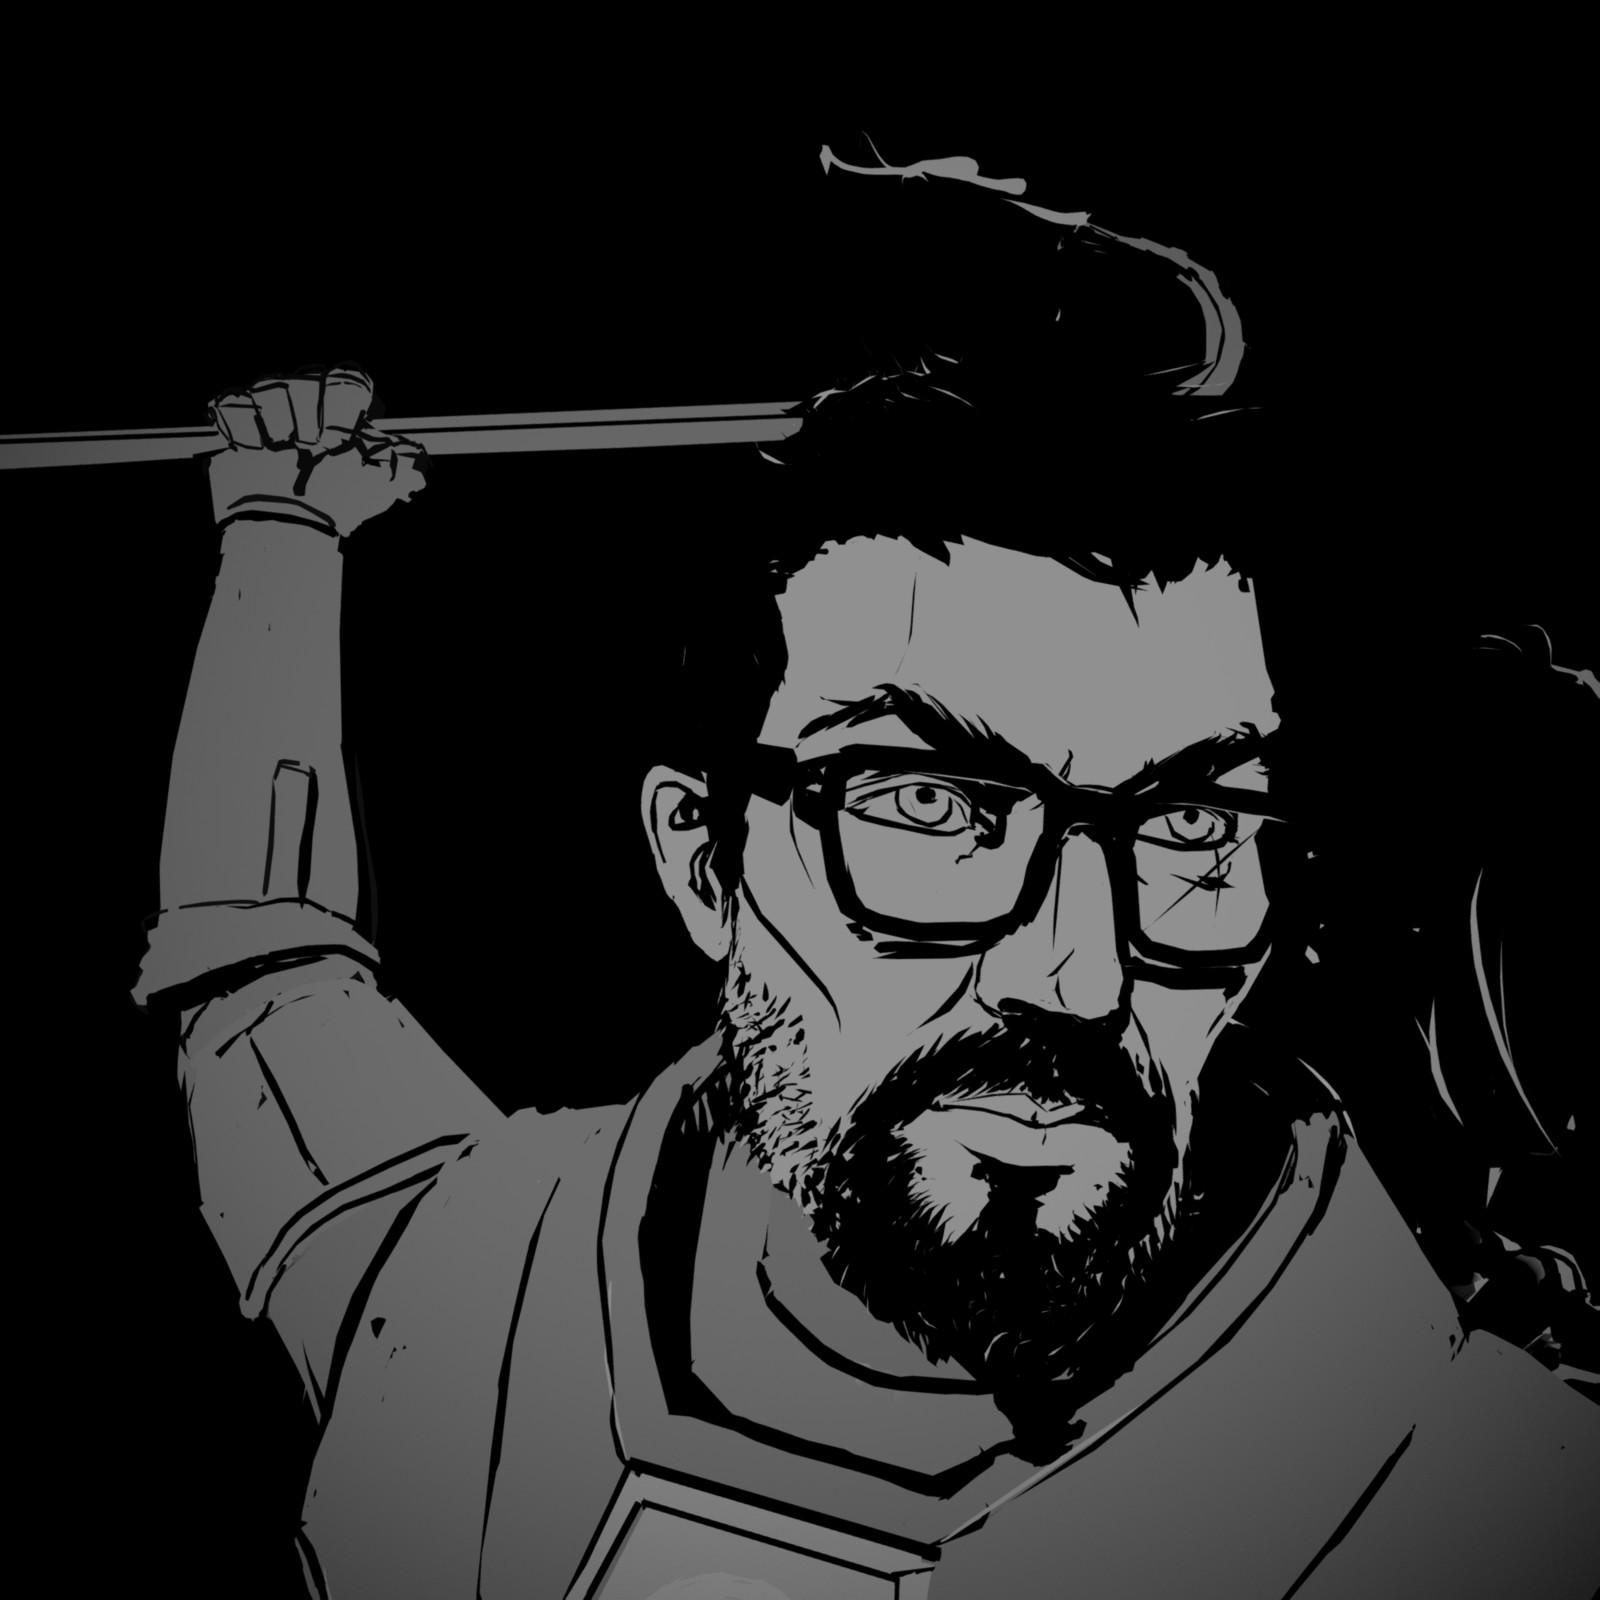 Quill - Half-Life 2: Episode 1 Fanart